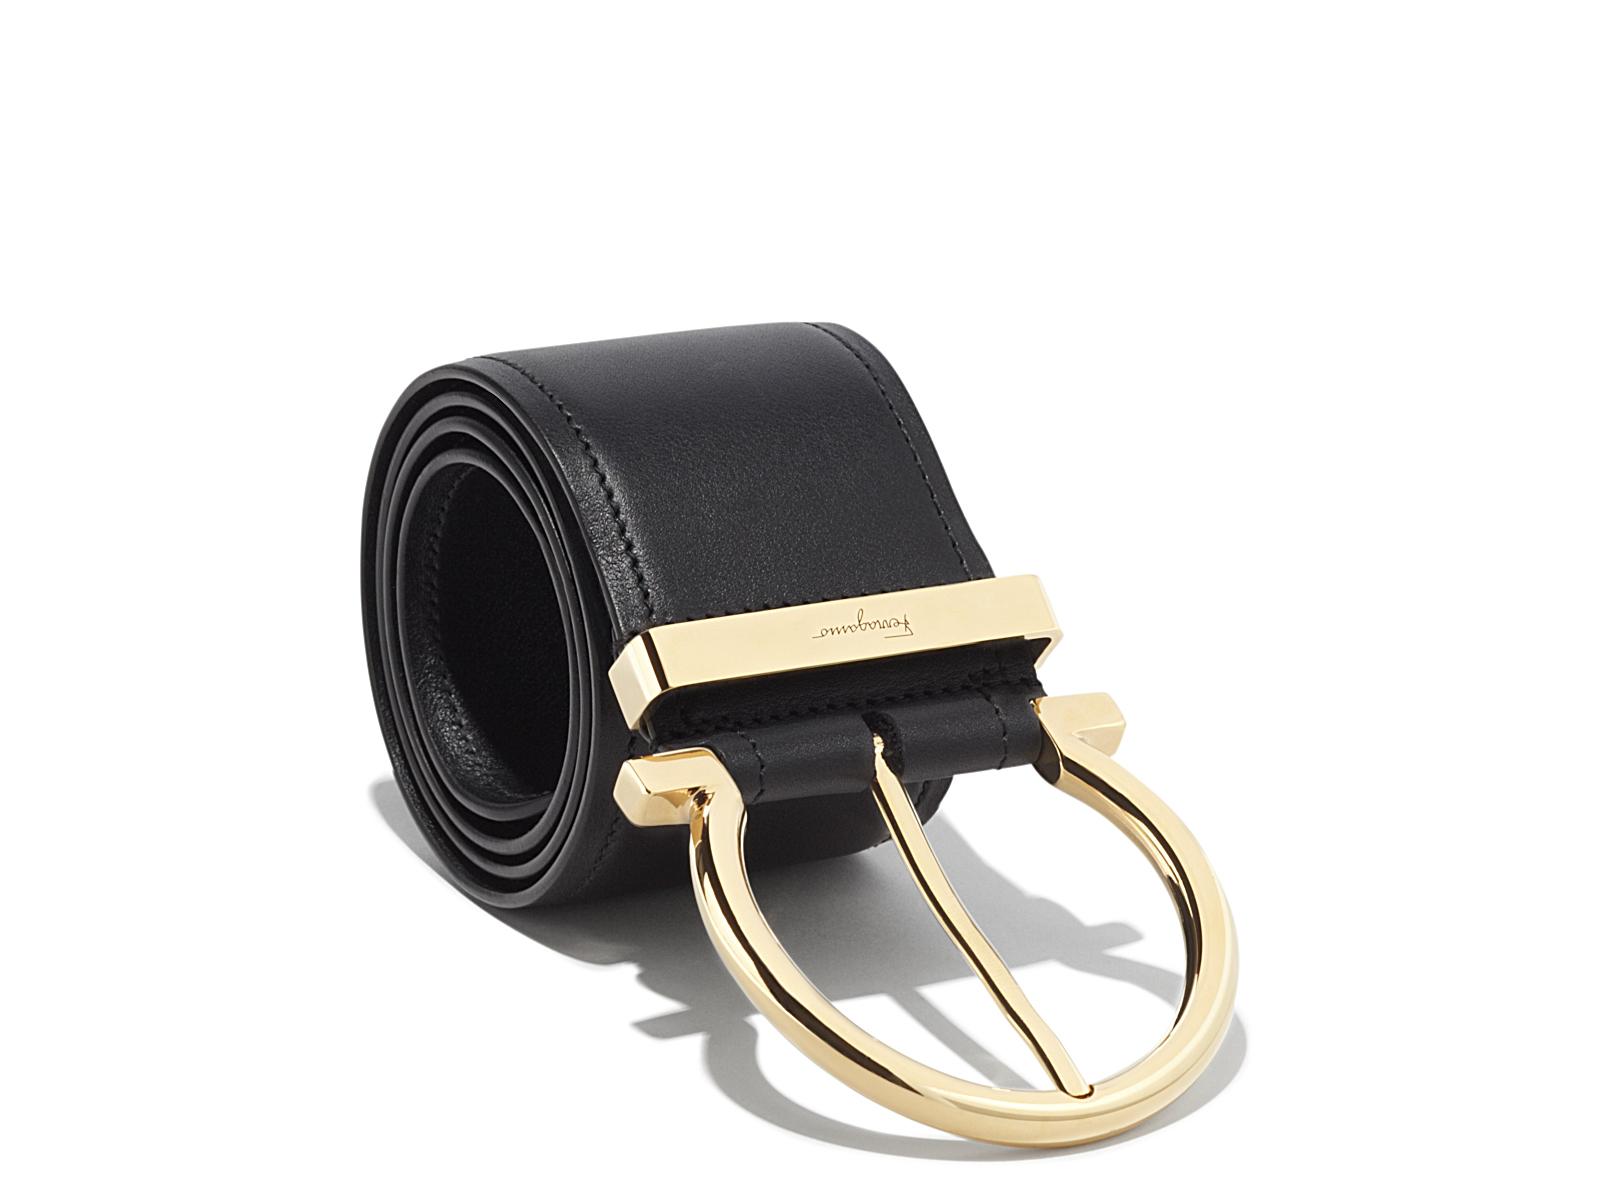 56c5deb3d2c4 Lyst - Ferragamo Oversized Single Gancio Belt in Black